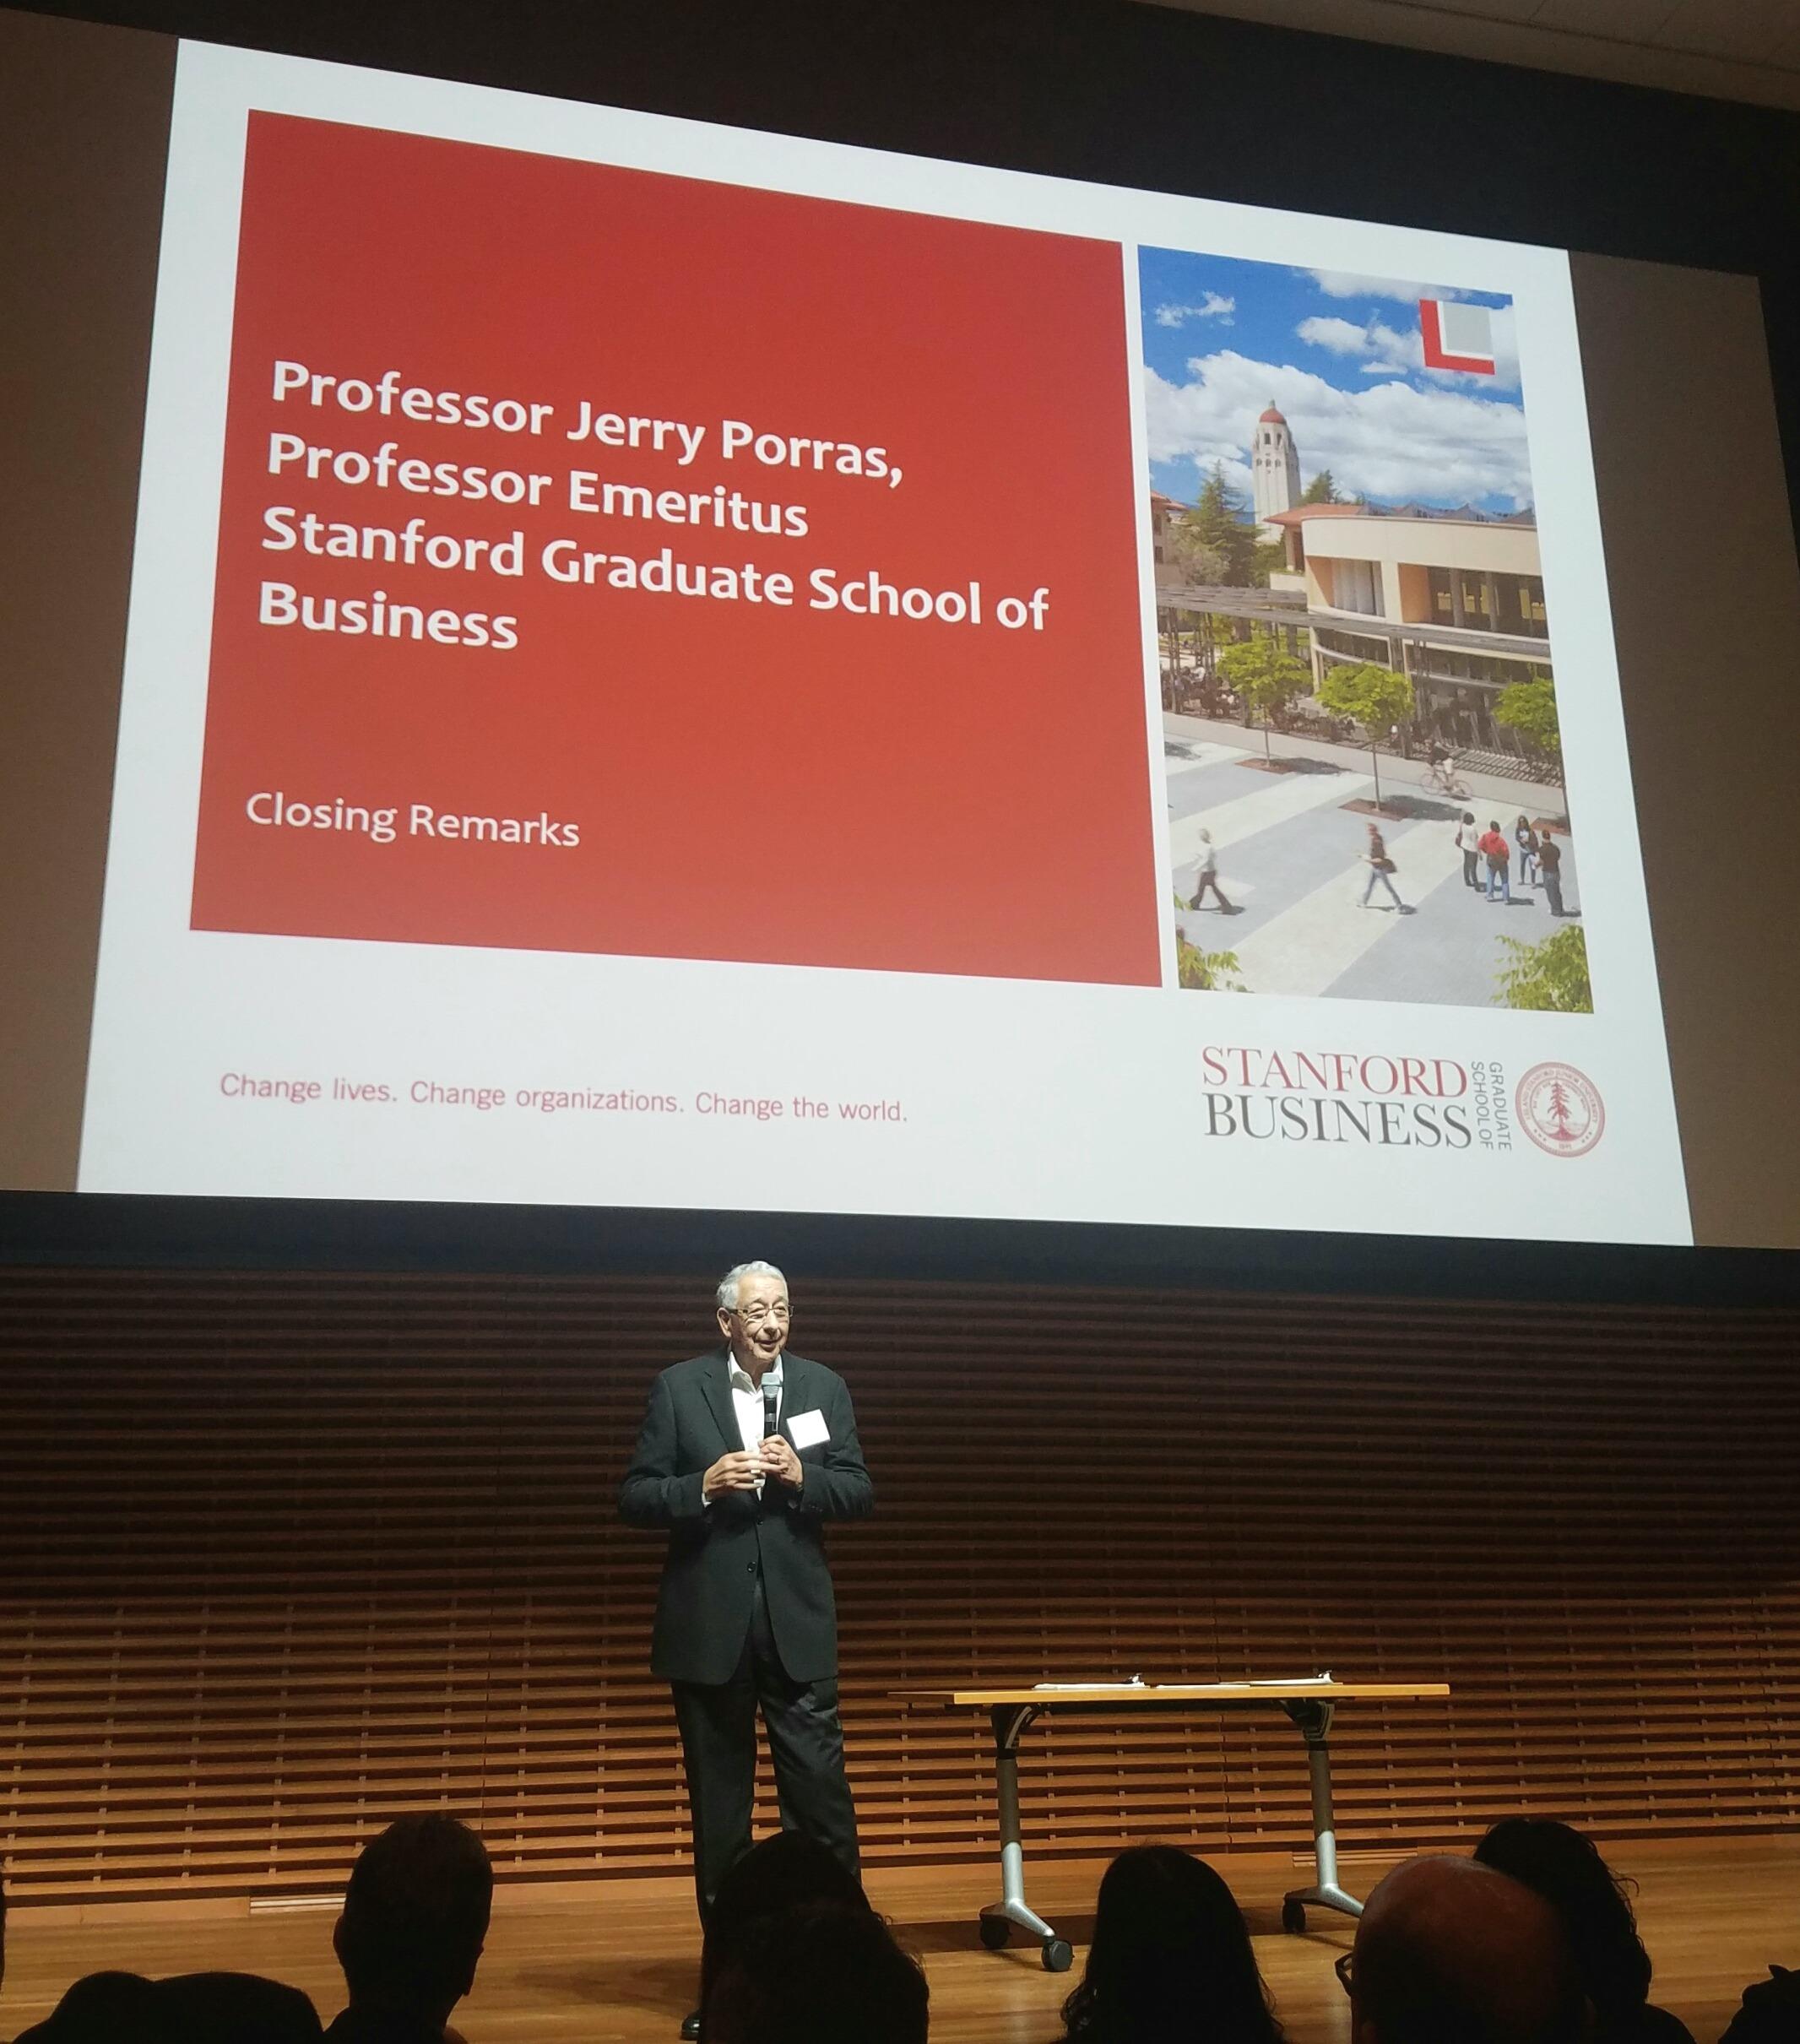 Jerry Porras, Professor Emeritus at Stanford Graduate School of Business